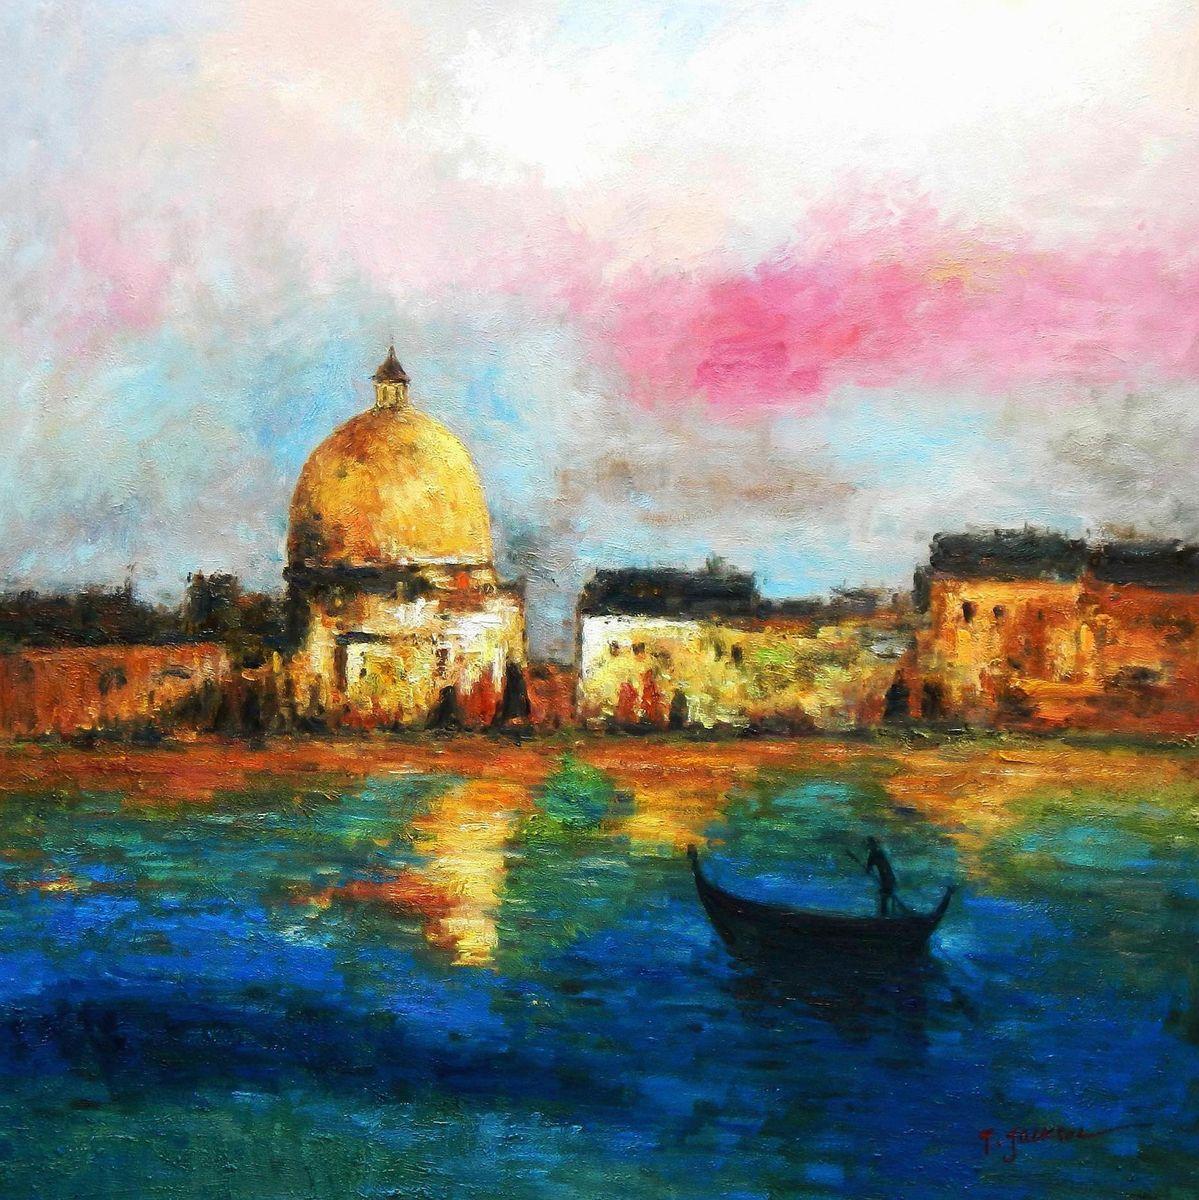 Modern Art - Venedig Canale Grande g92941 80x80cm handgemaltes Gemälde